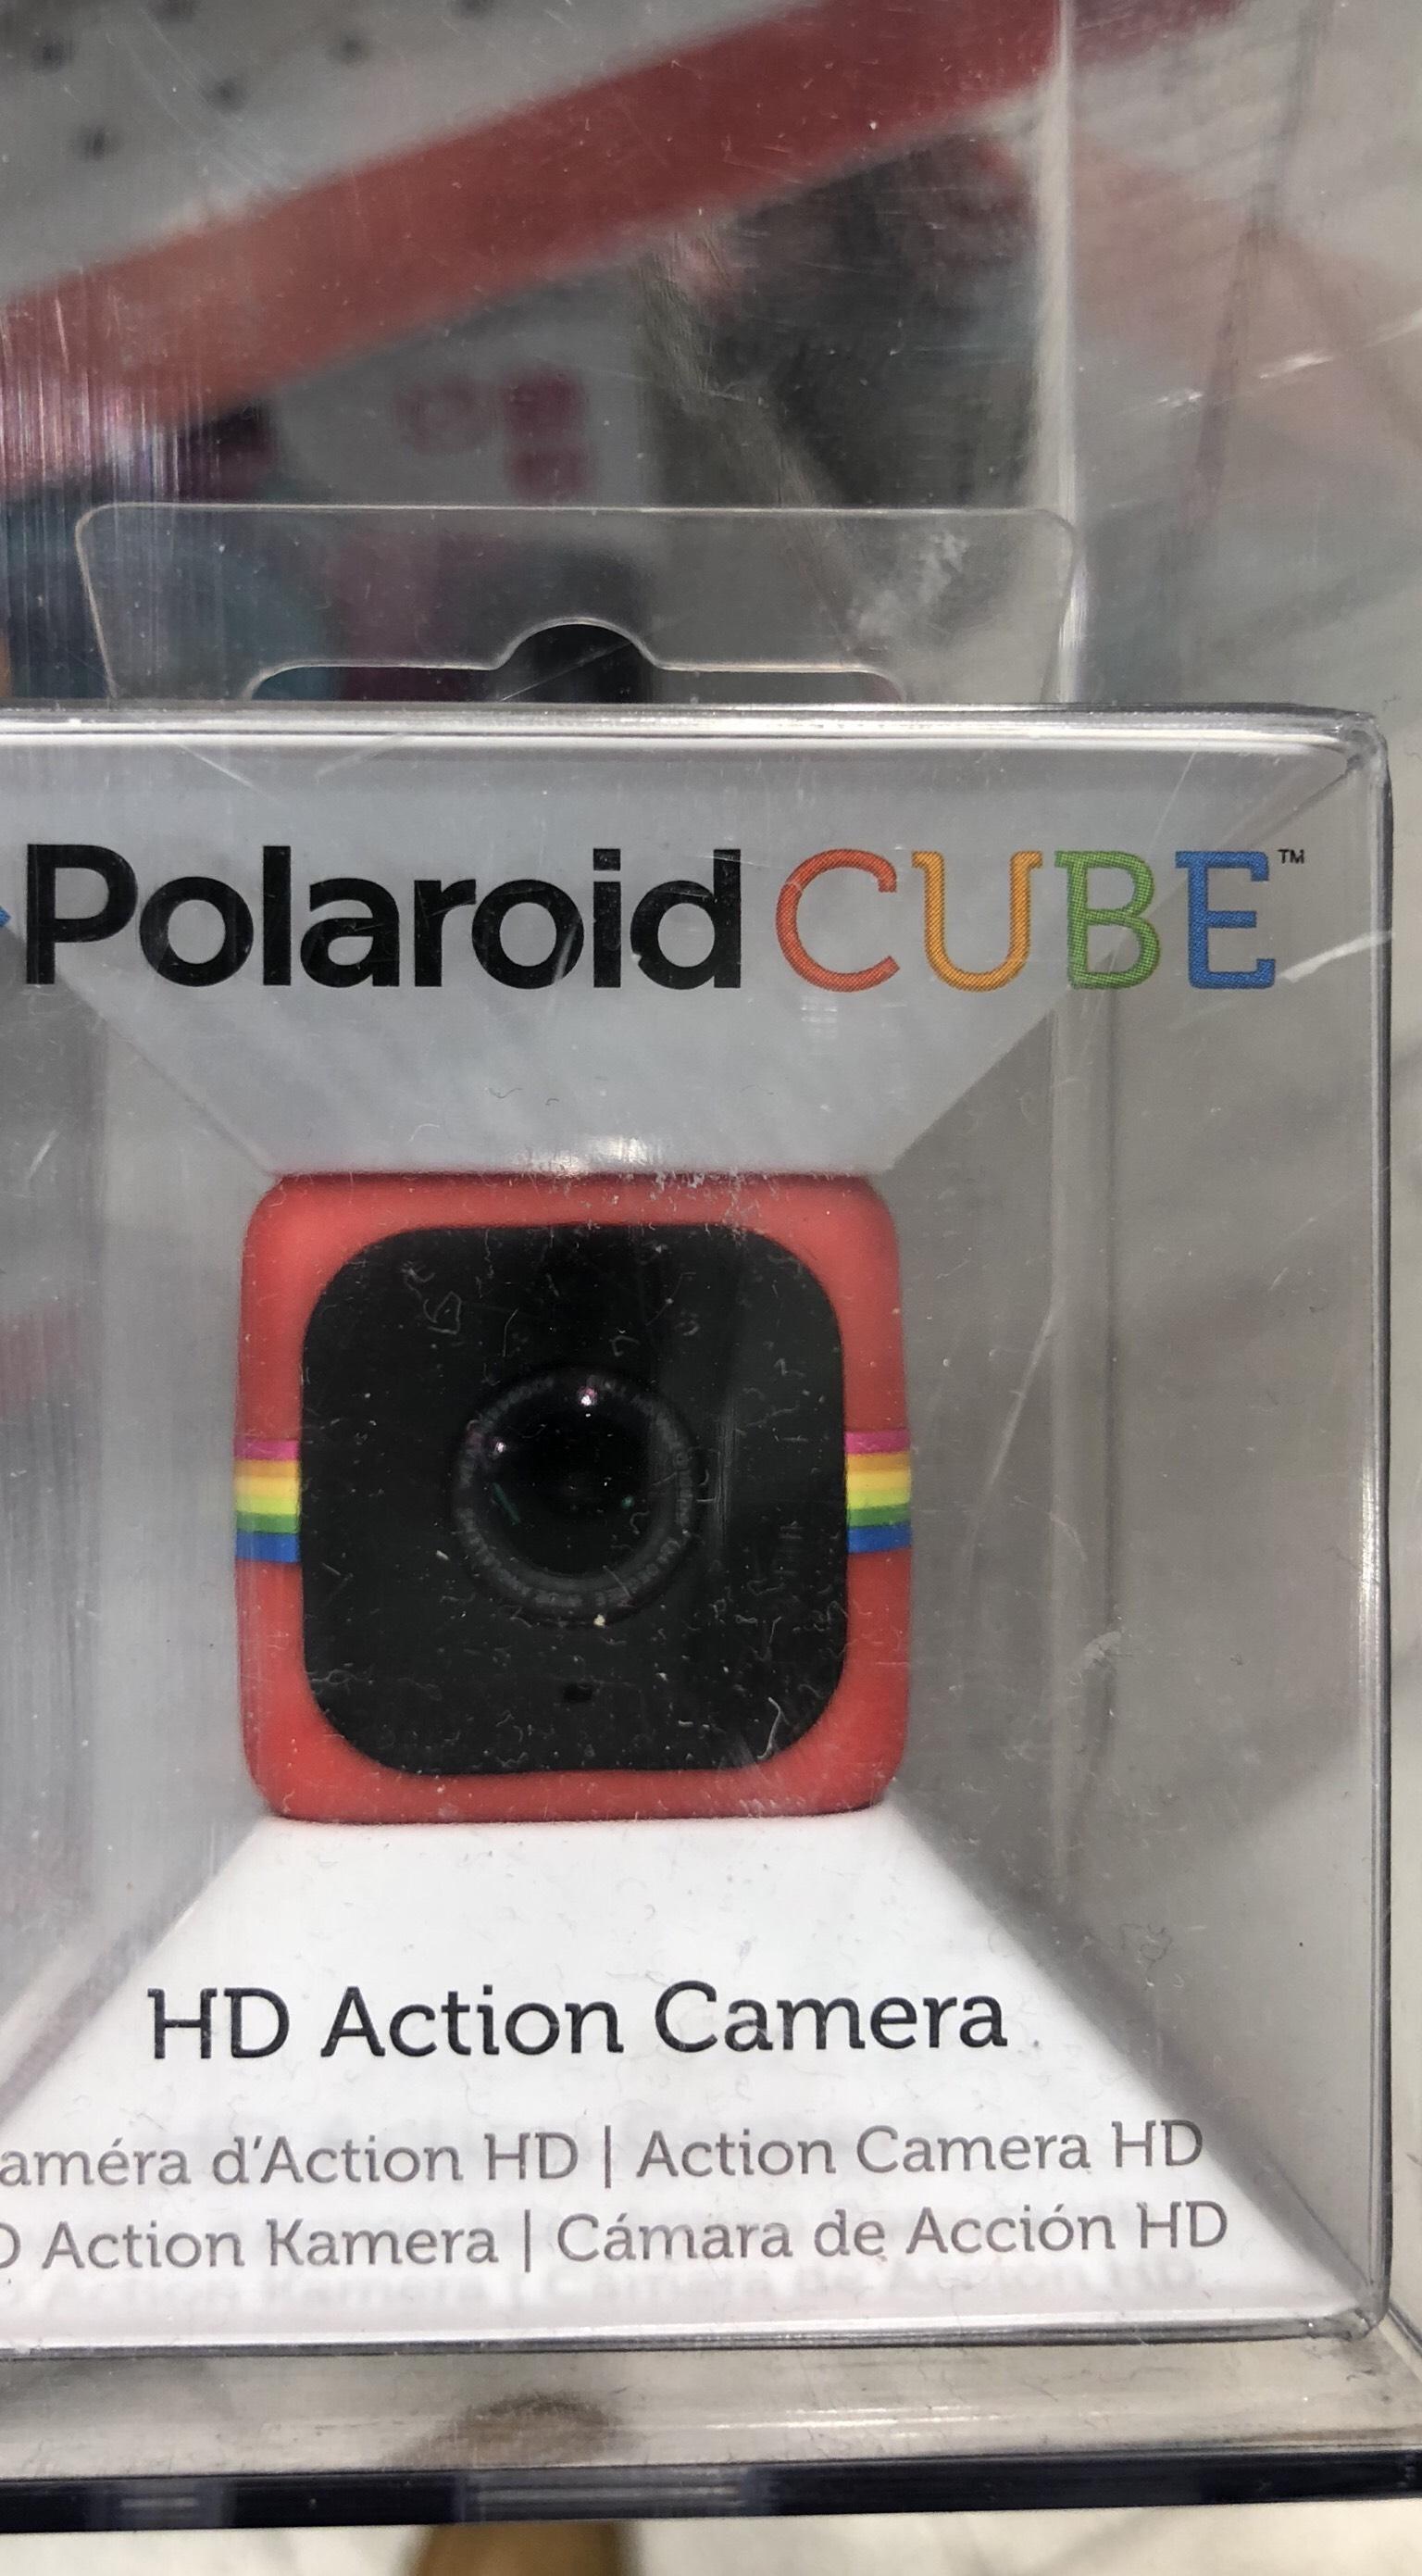 (Lokal - Toys R Us - Kiel) Polaroid Cube HD 1080p Lifestyle Action Videokamera (Rot), 35x35x35mm